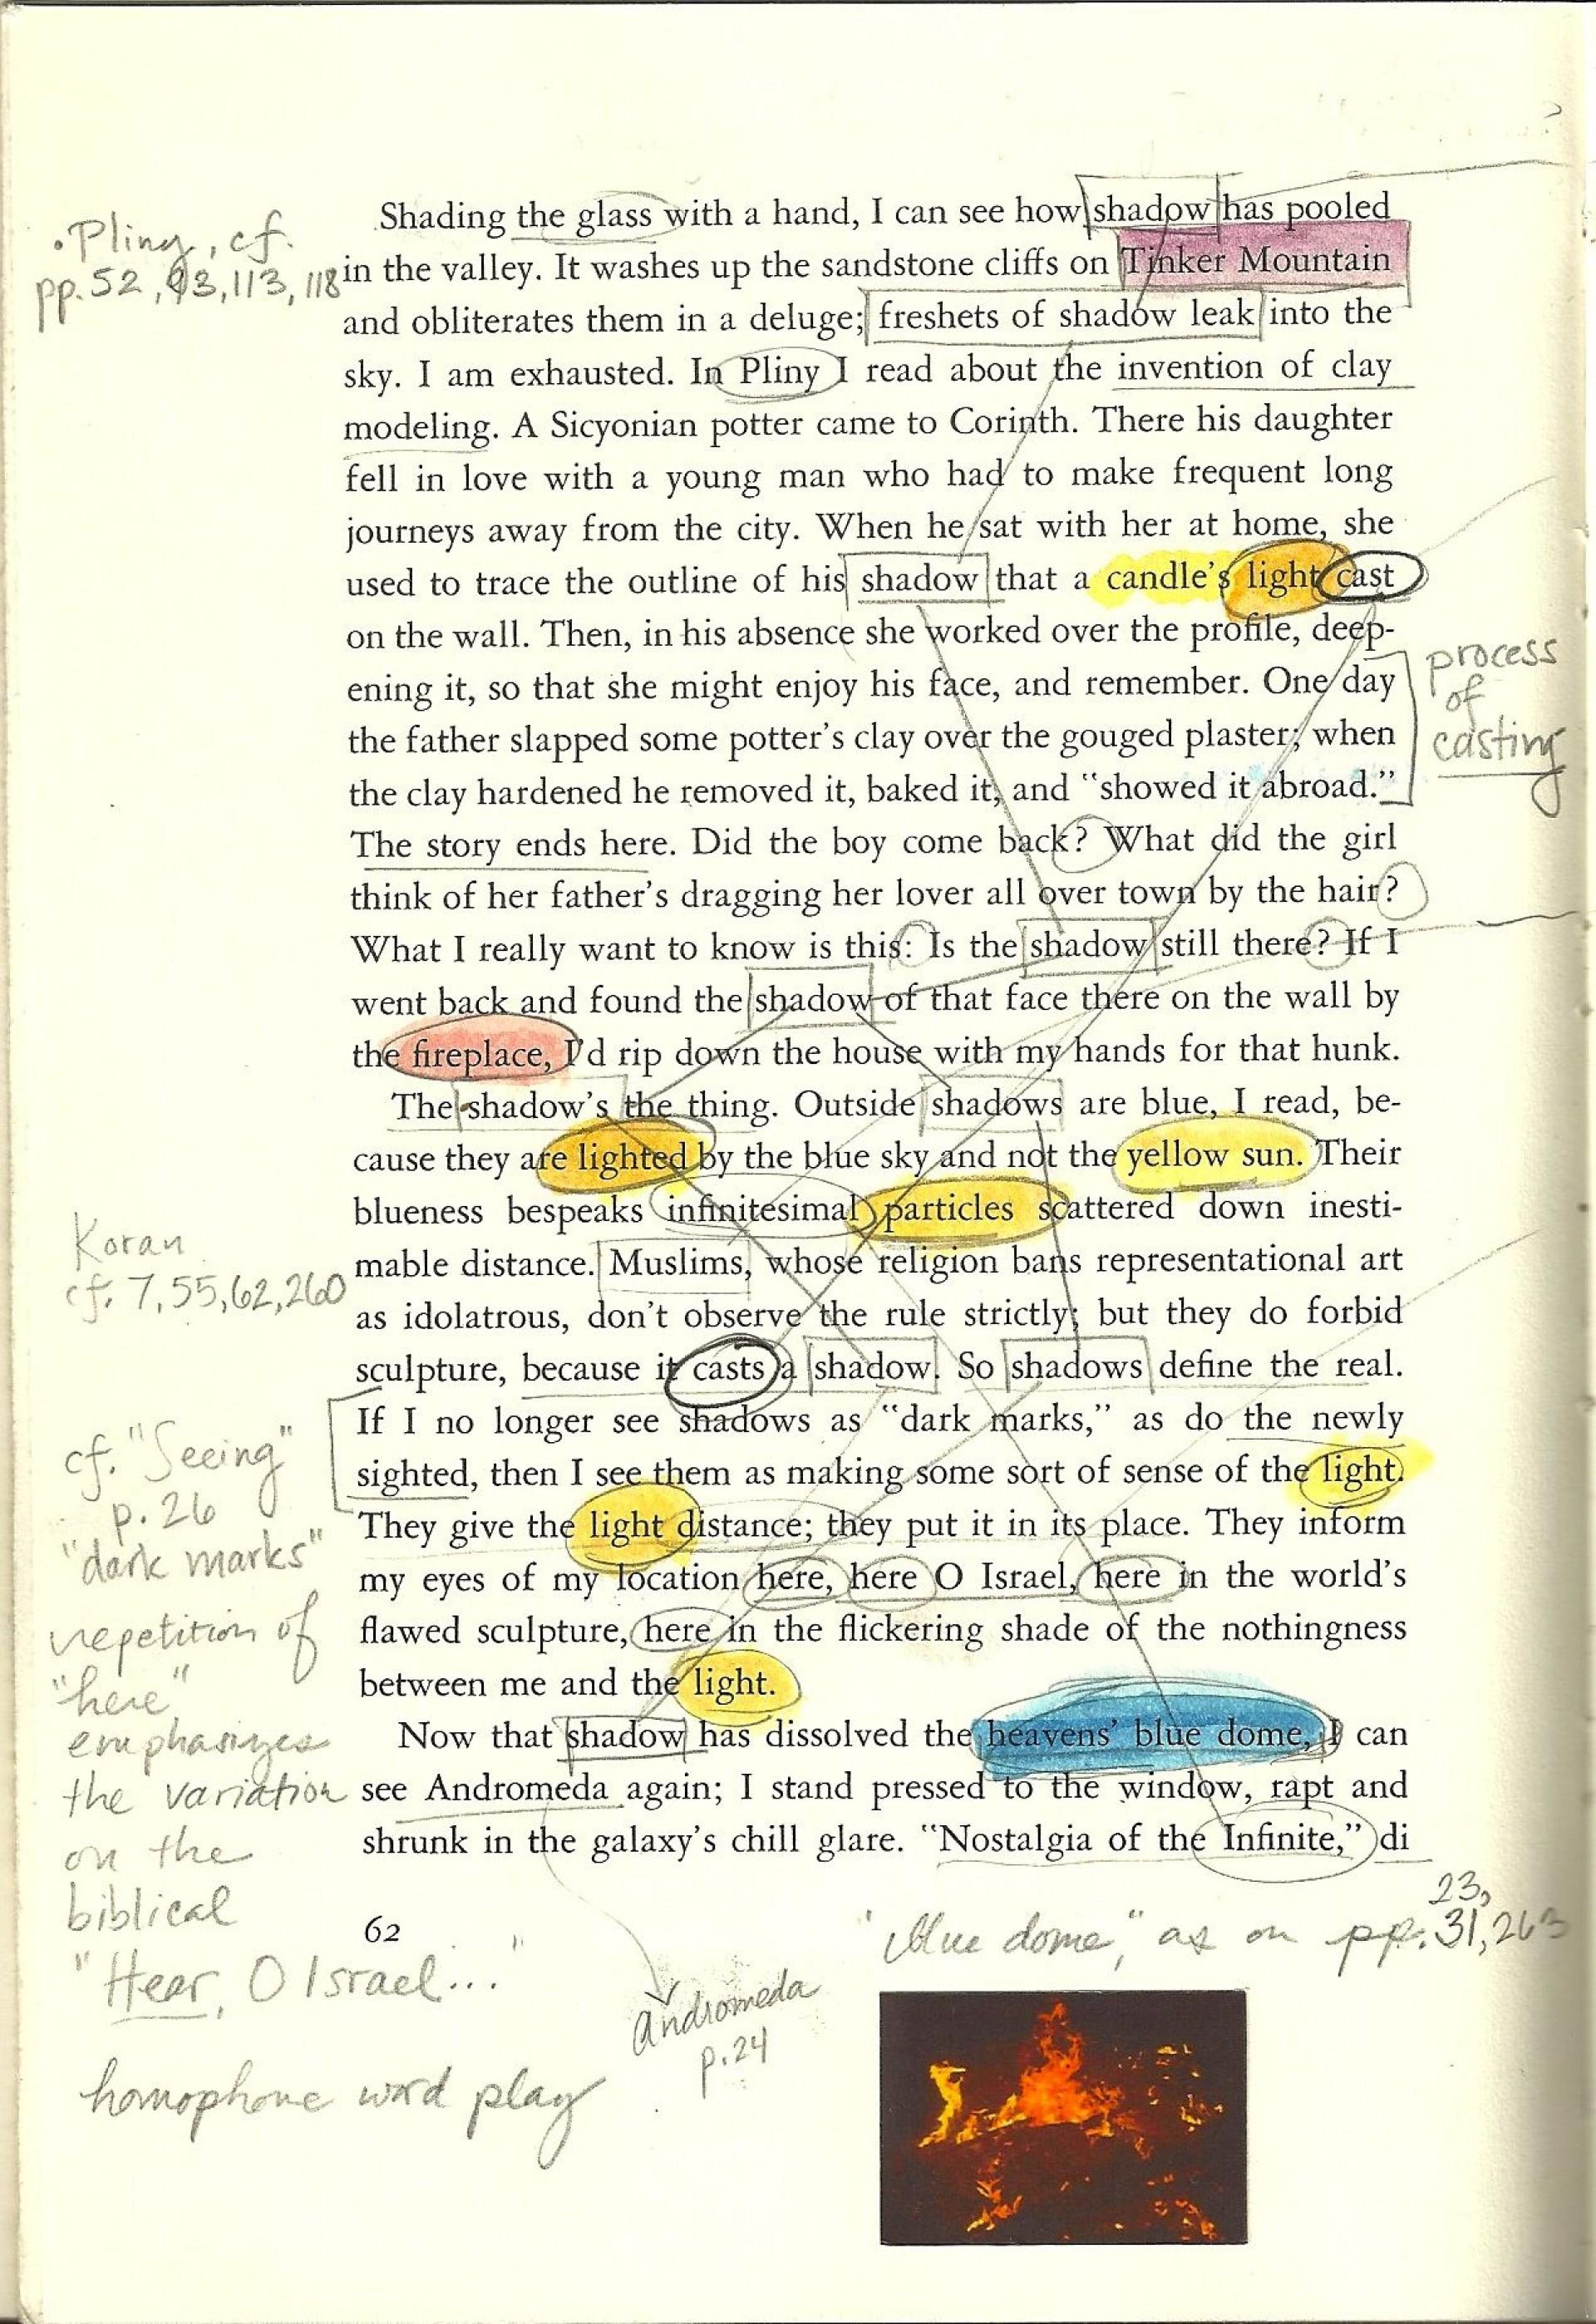 005 Annie Dillard Essays Essay Stirring Stunt Pilot Pdf An American Childhood 1920